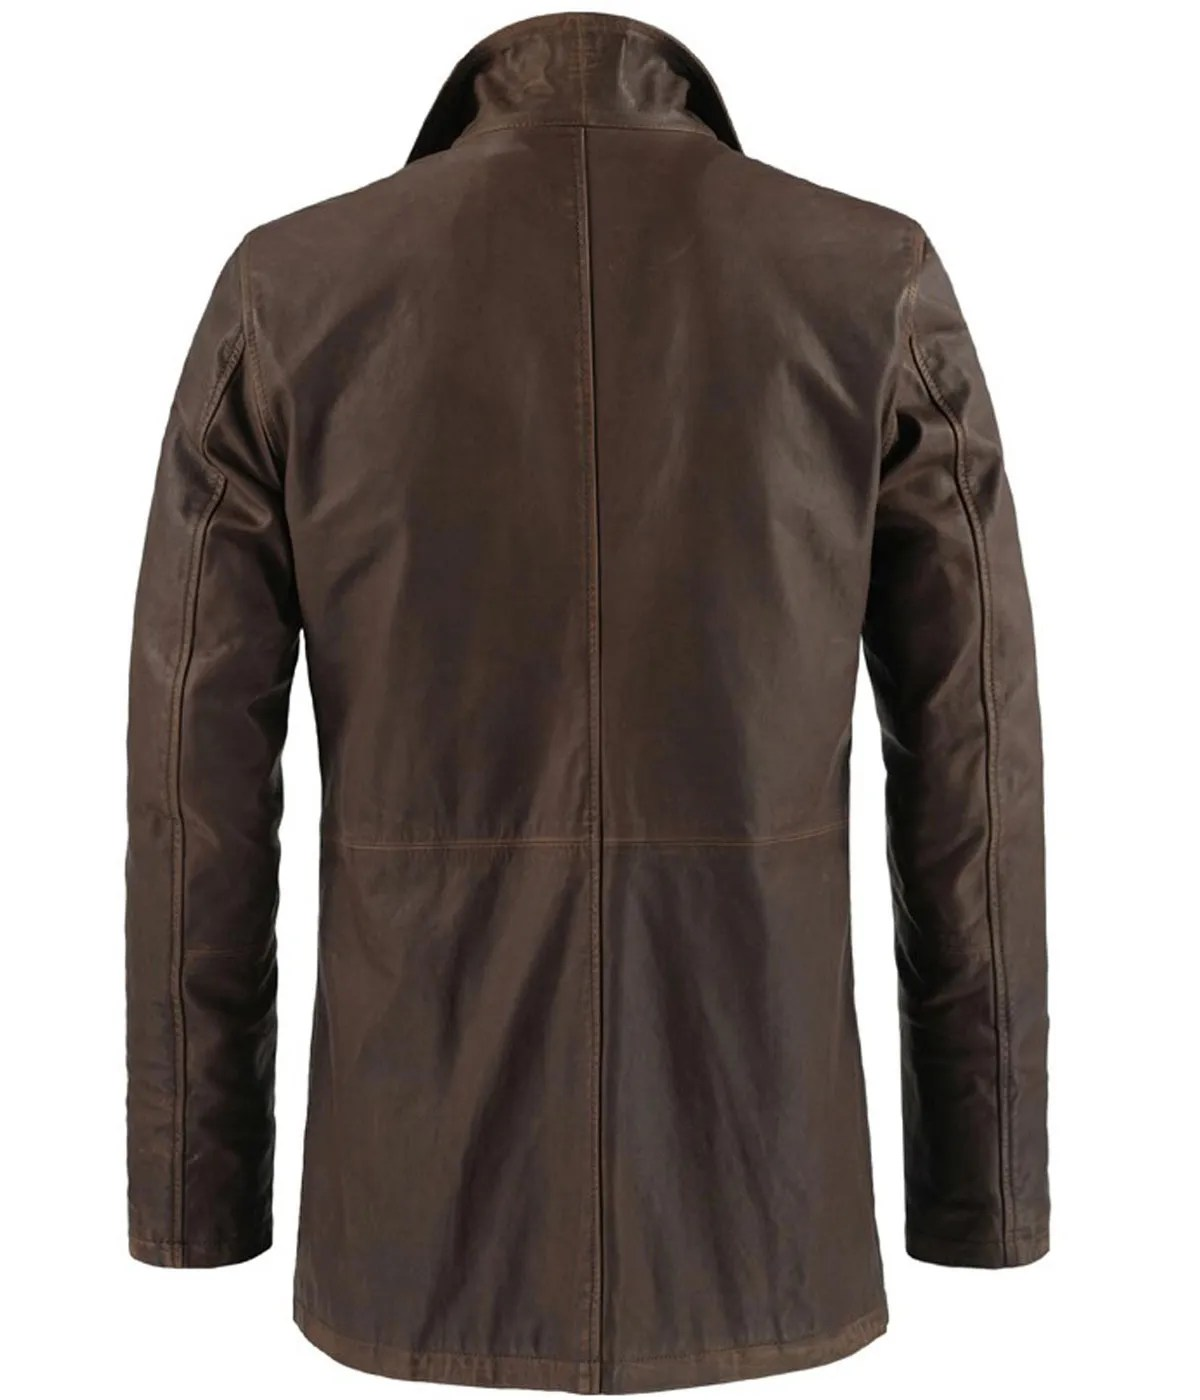 supernatural-dean-winchester-brown-leather-jacket